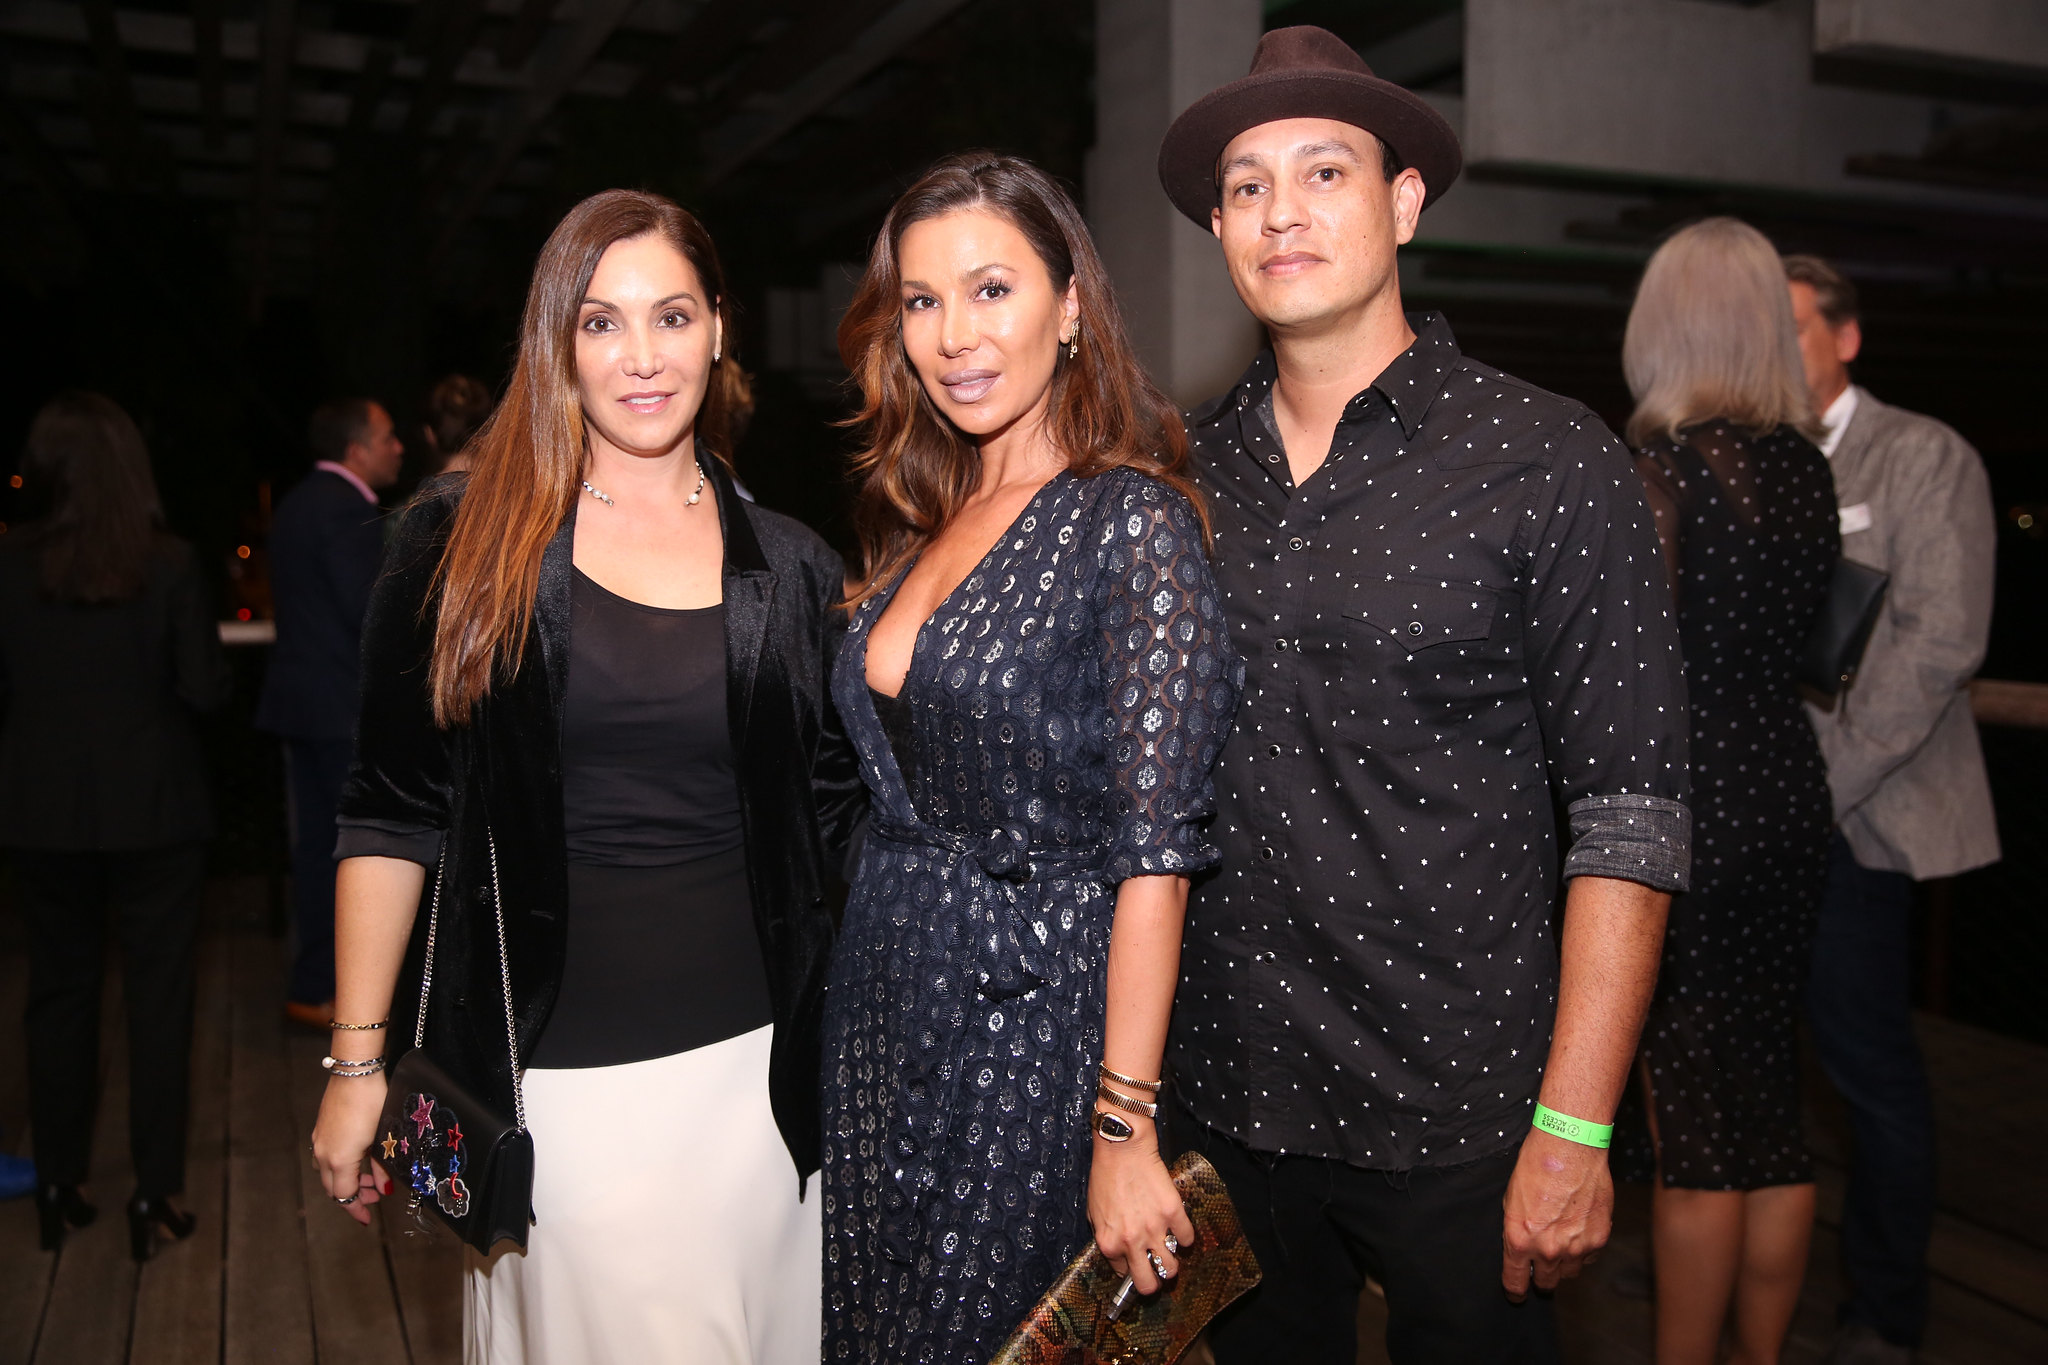 Soledad Lowe, Andreea Baclea, & Max Osceola